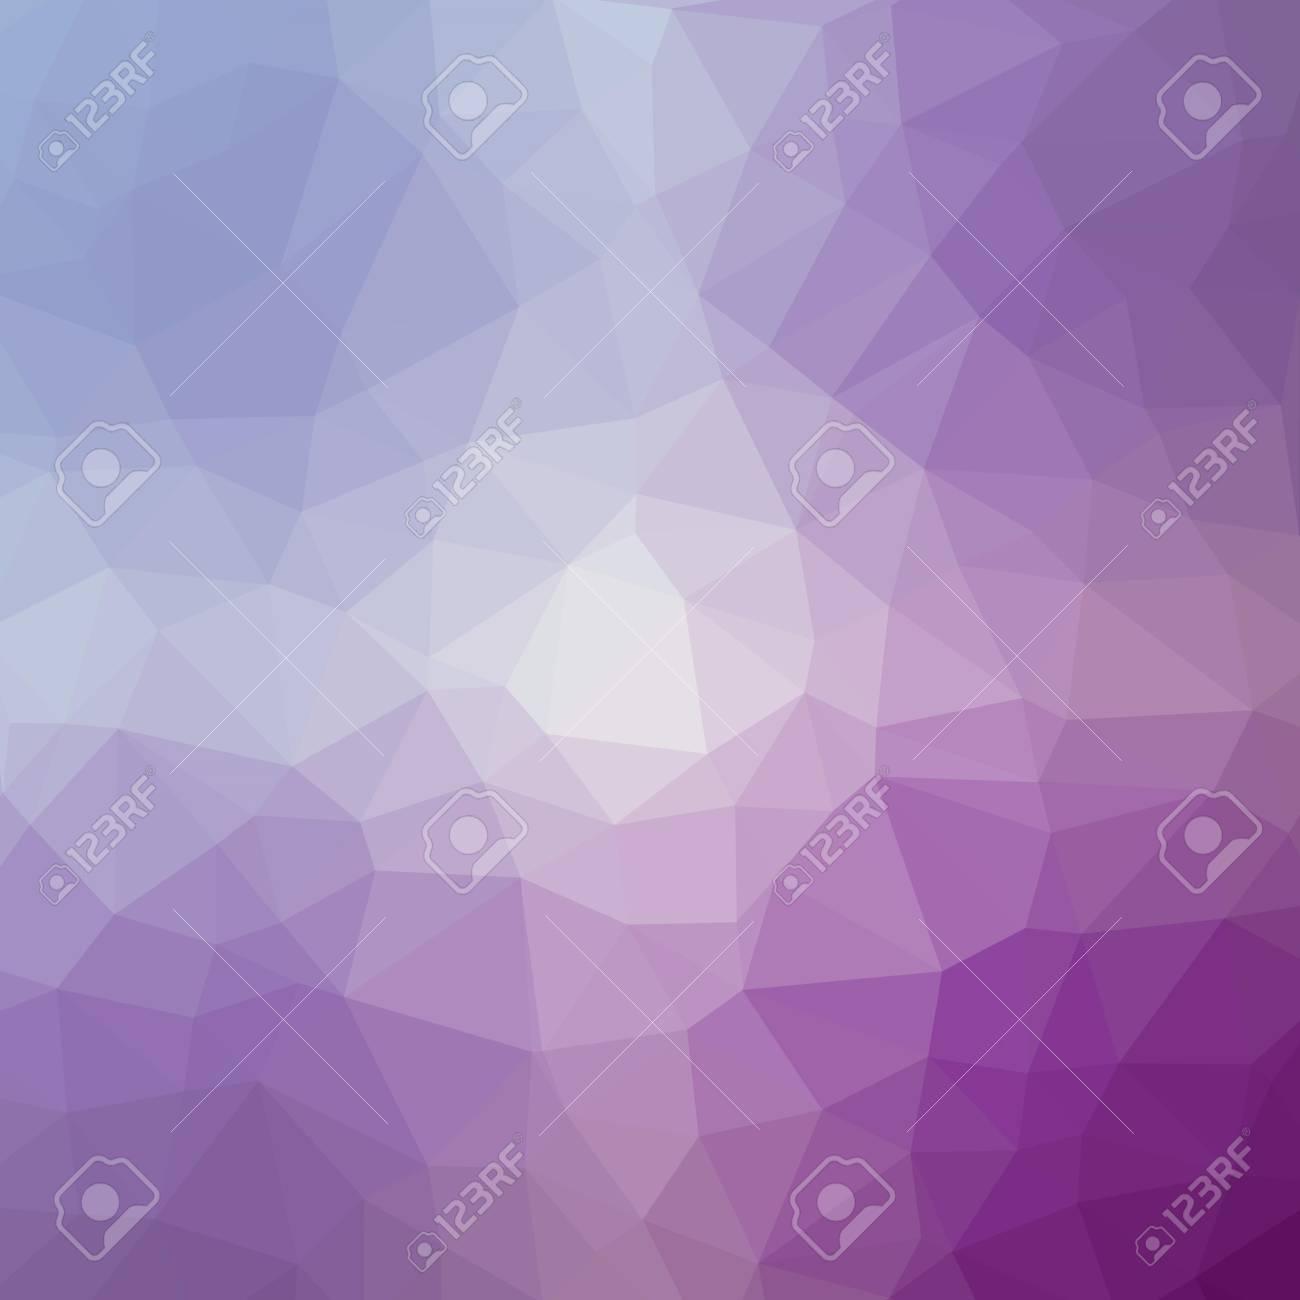 Minimalist Polygonal Background in Iris and Lavender Tones